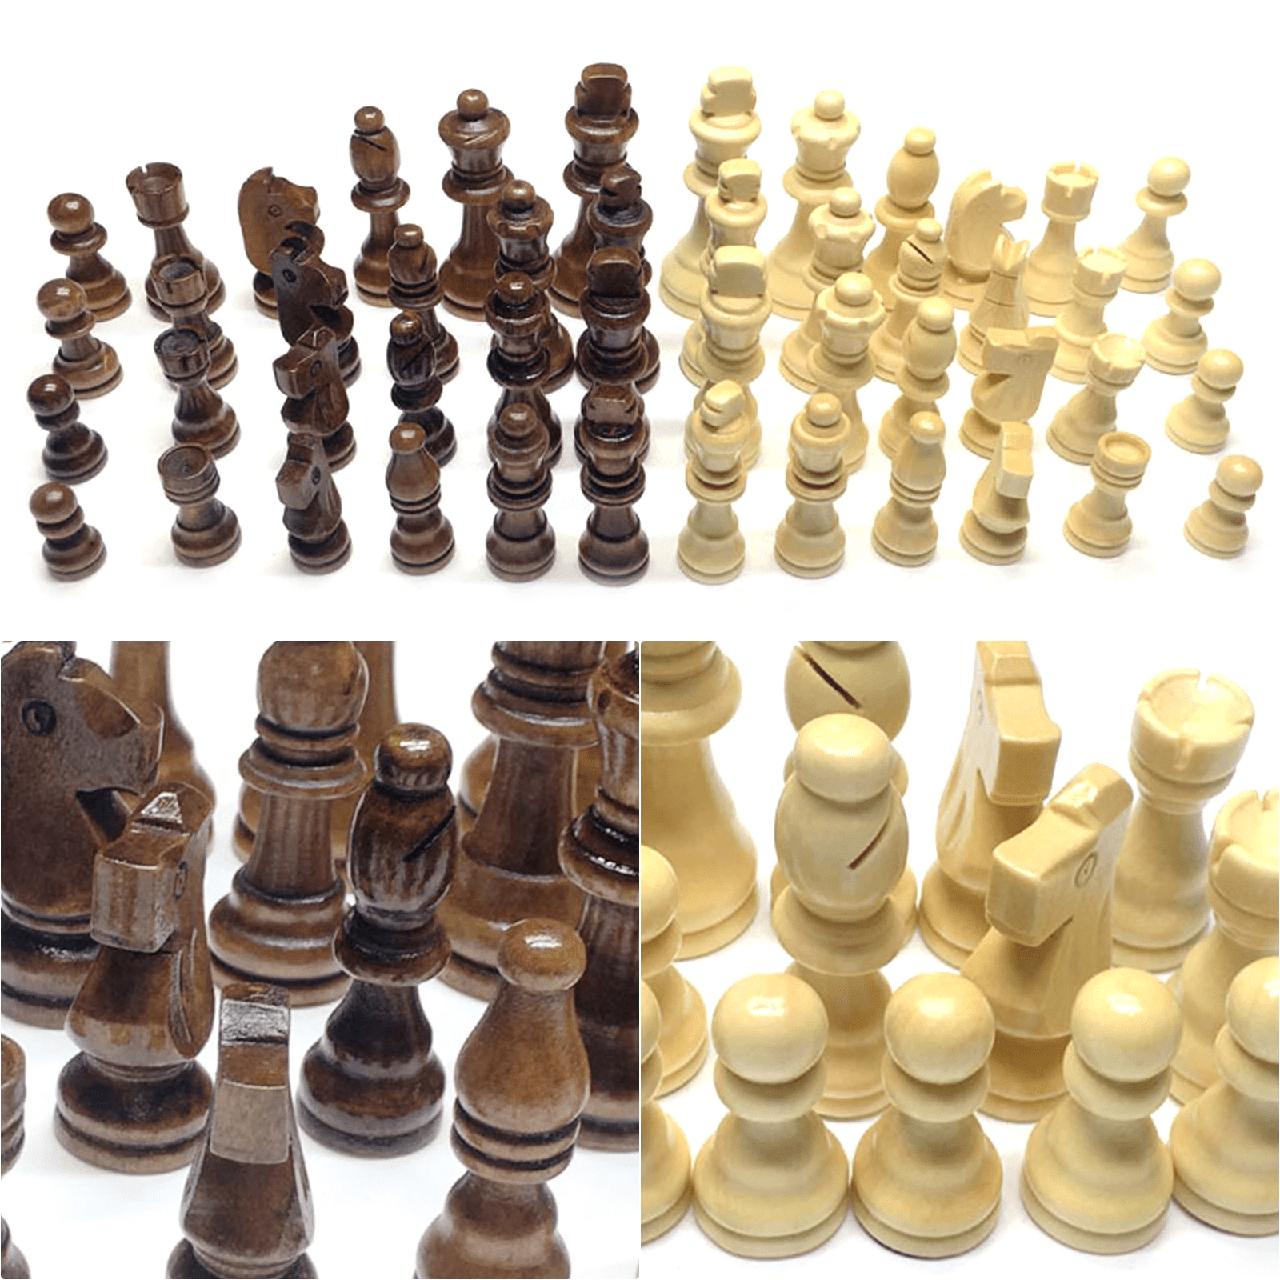 Фигурки для шахмат комплект шахматных фигур. Король 7,8 см. Материал - дерево 9.5